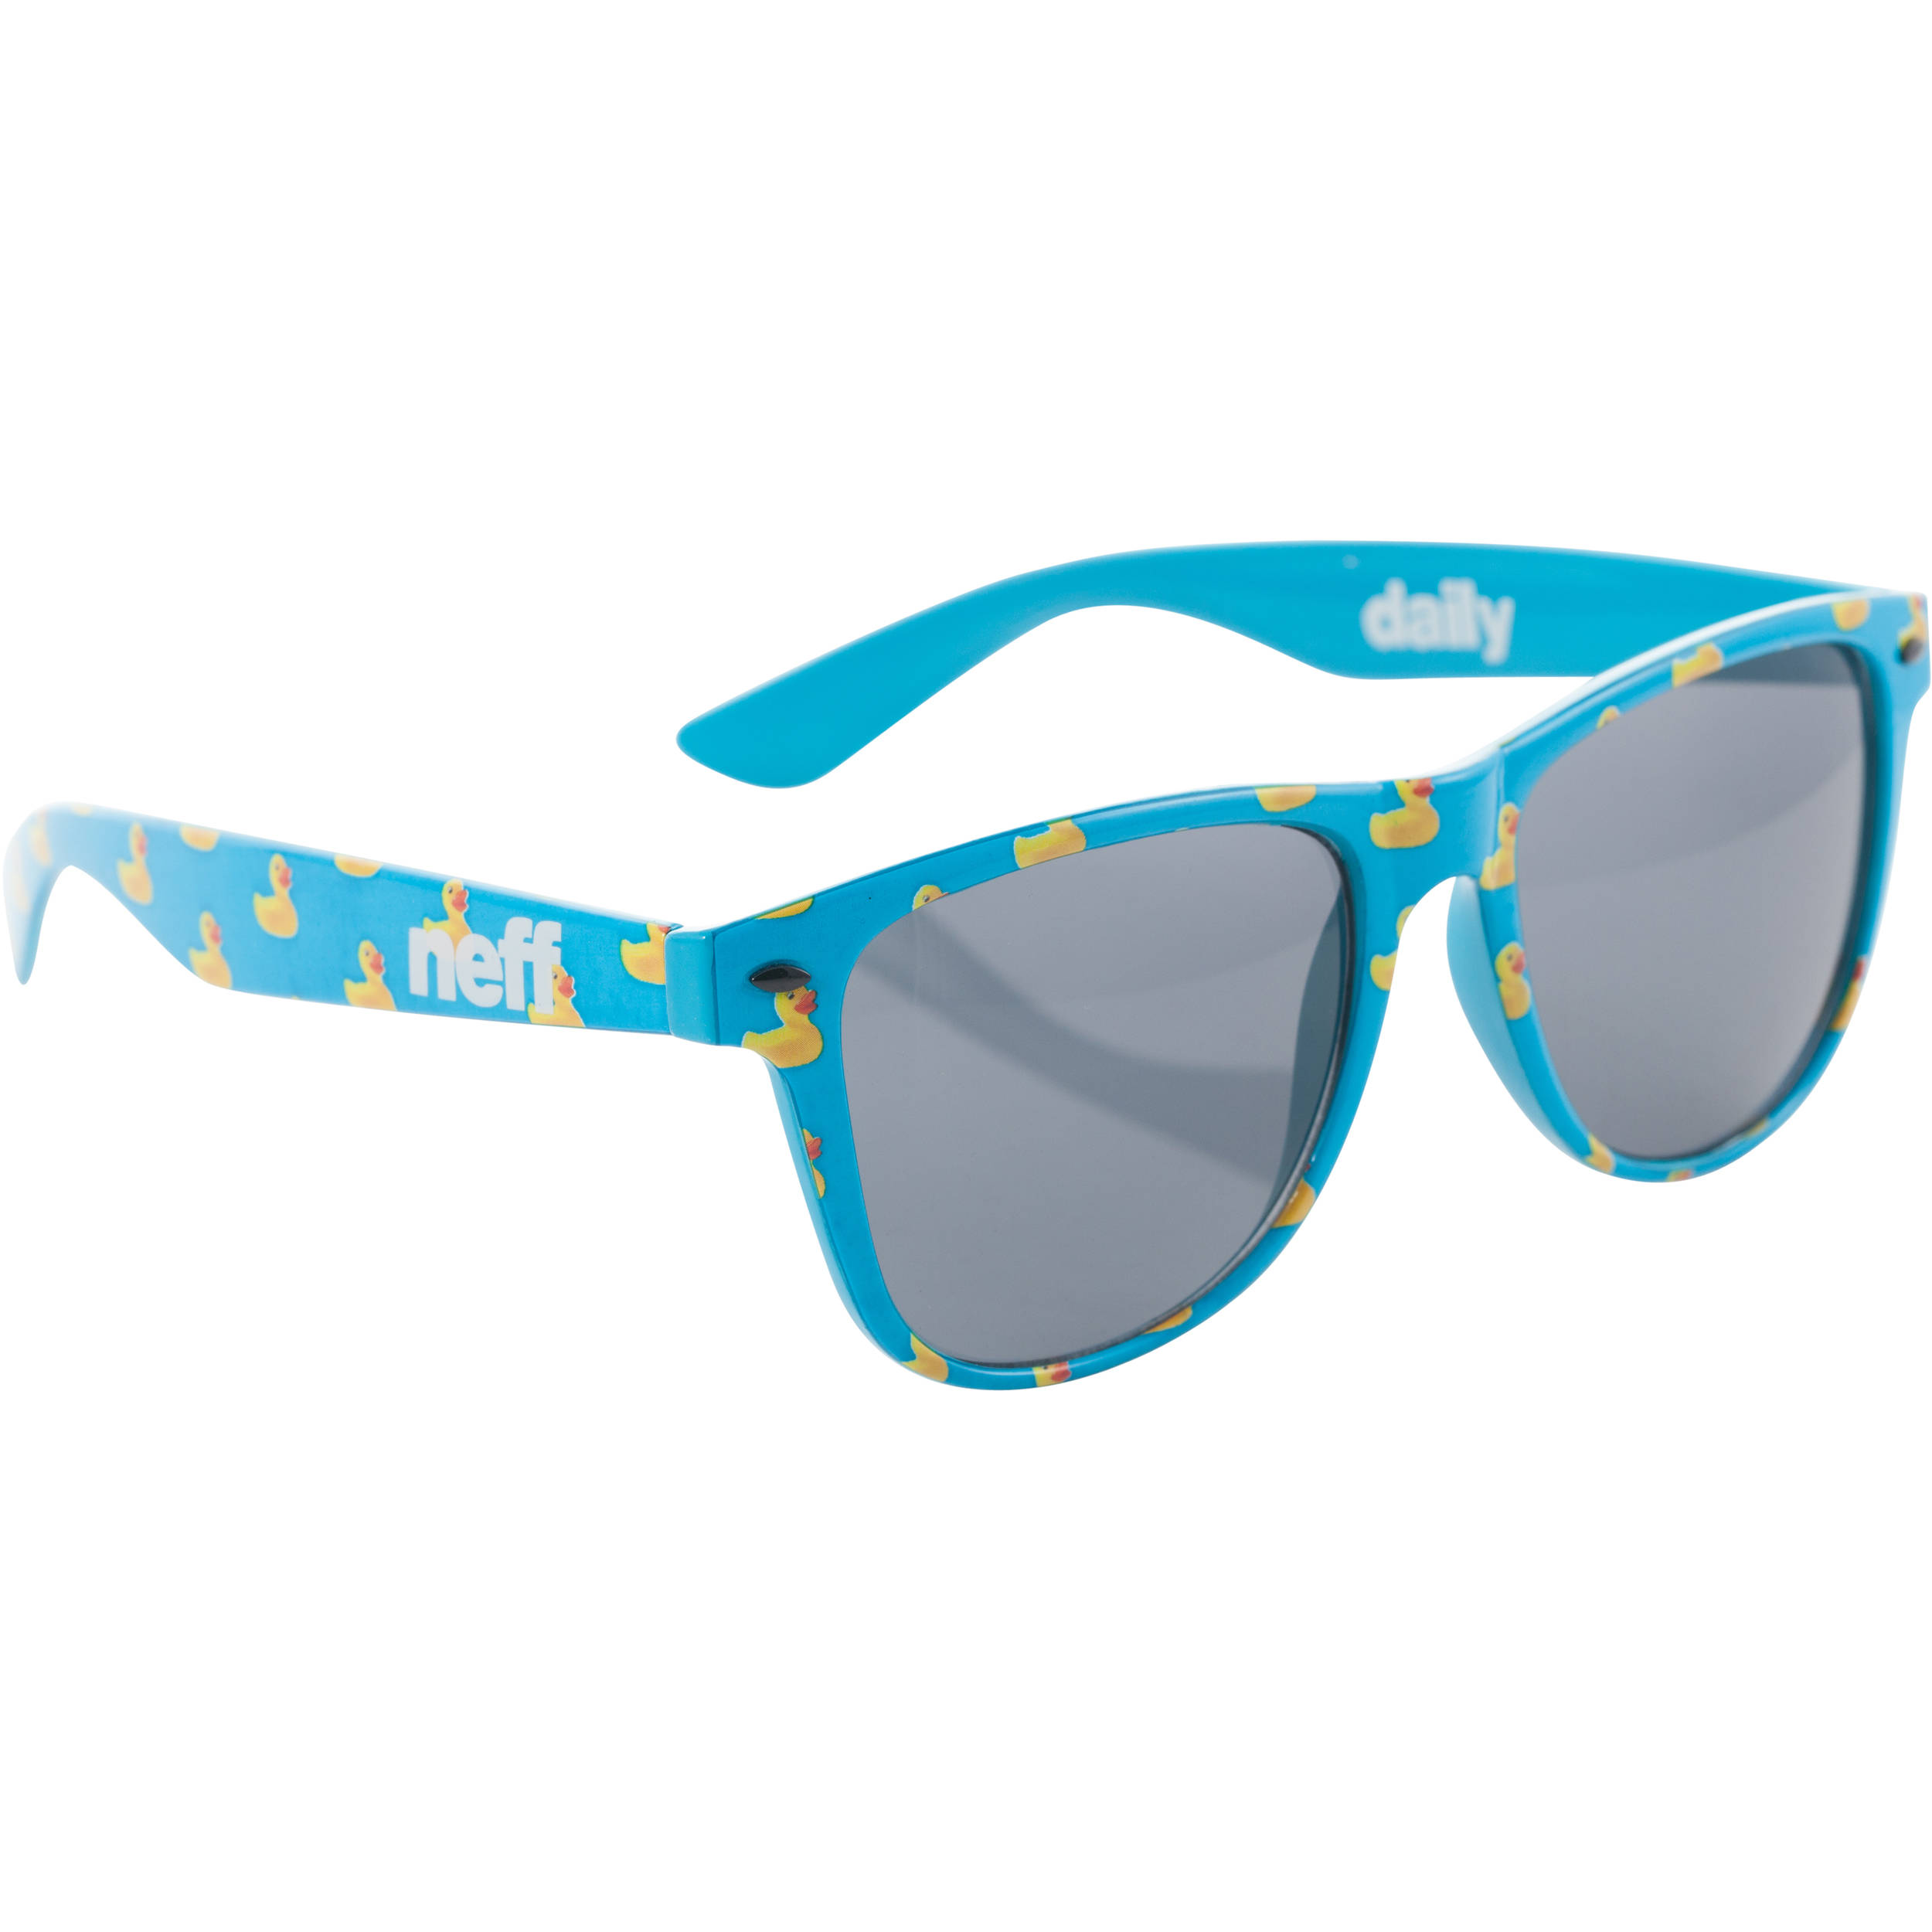 Neff Daily Sunglasses Ducky NISRCevyq